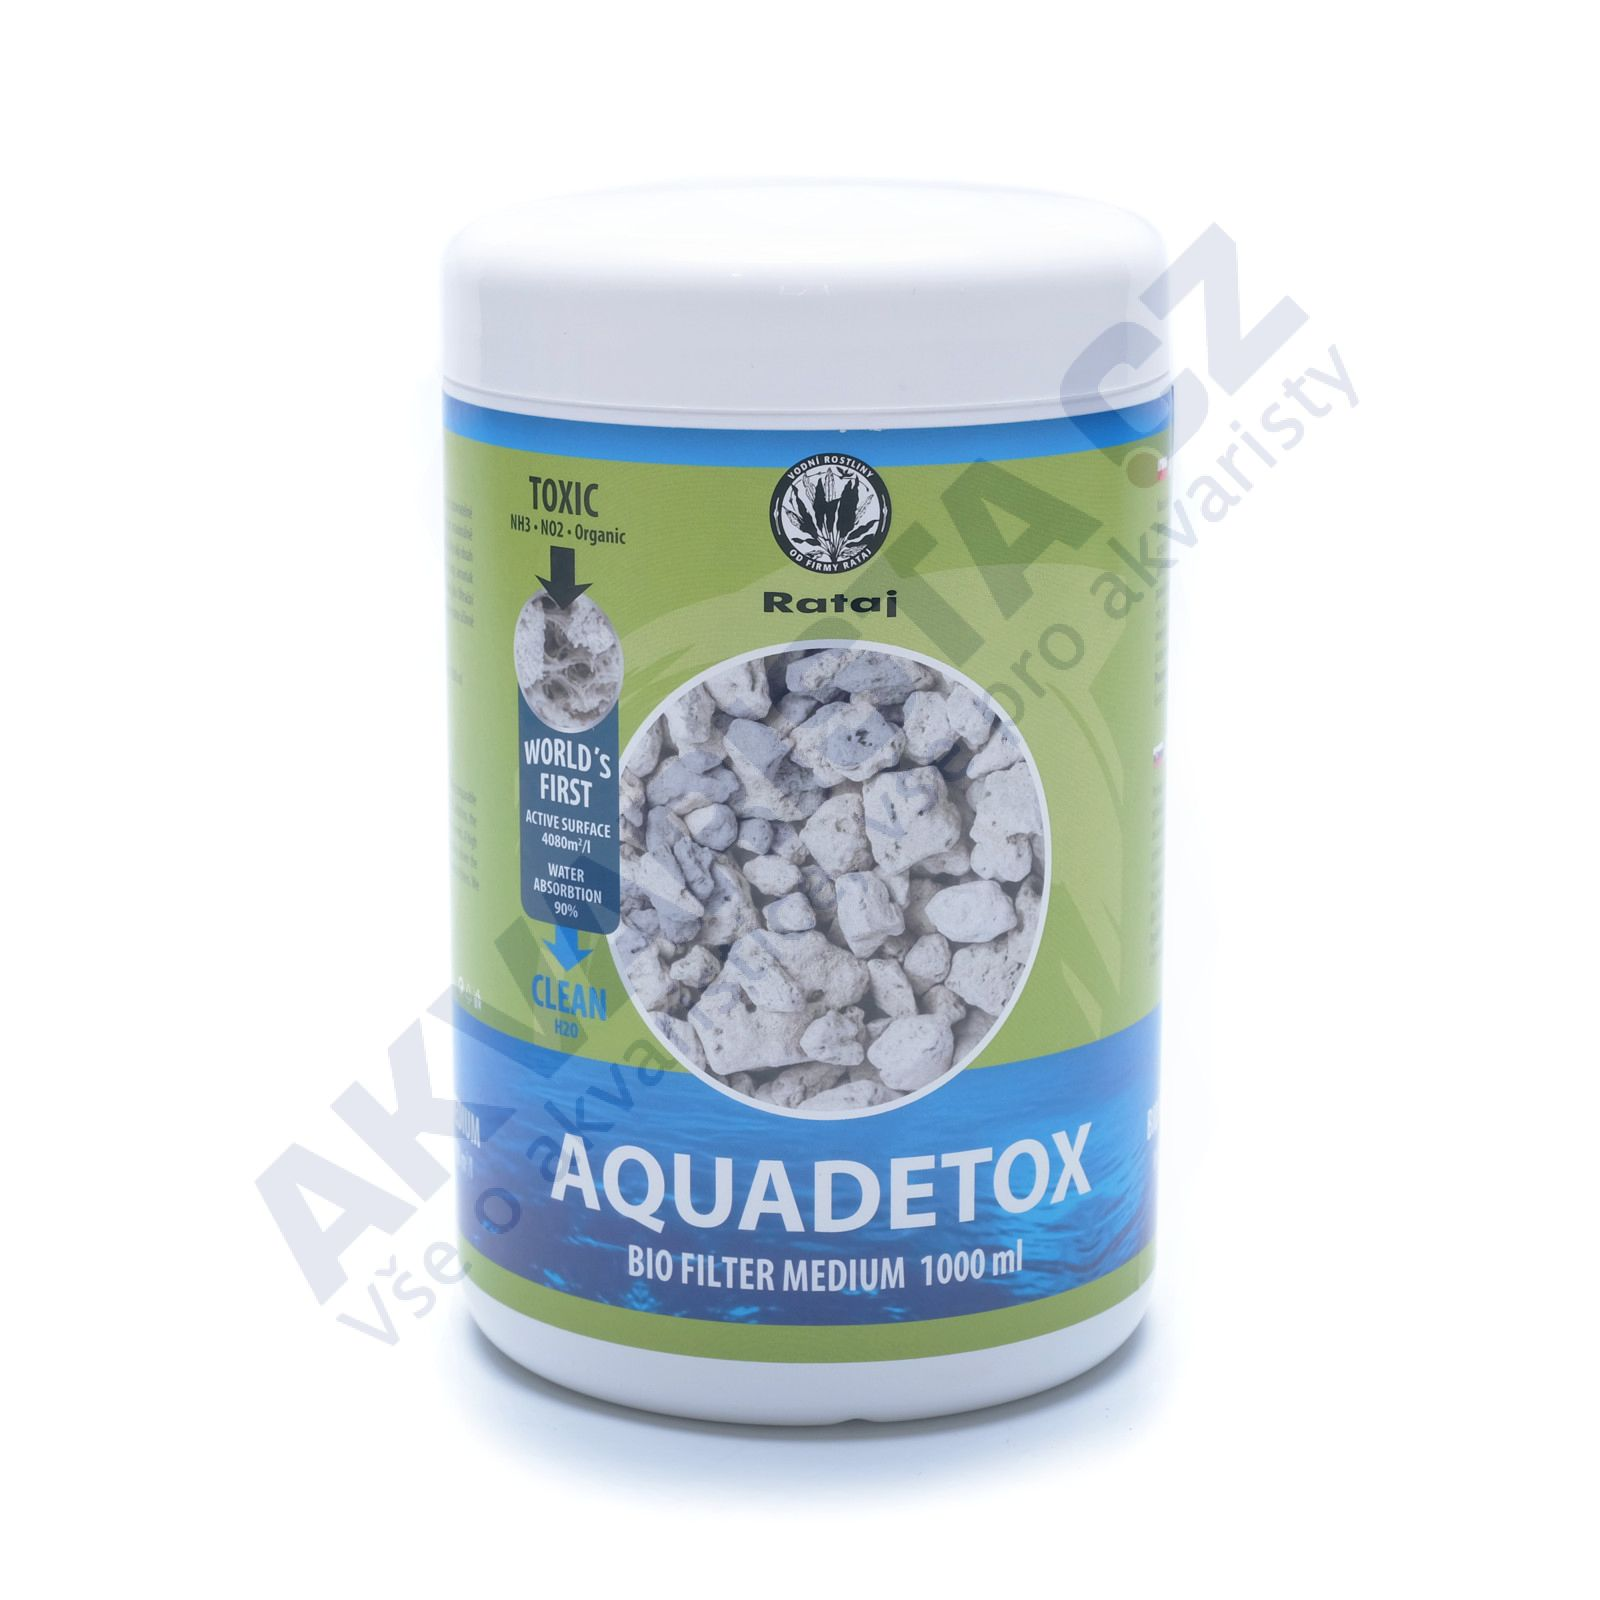 Rataj Aquadetox 1000 ml